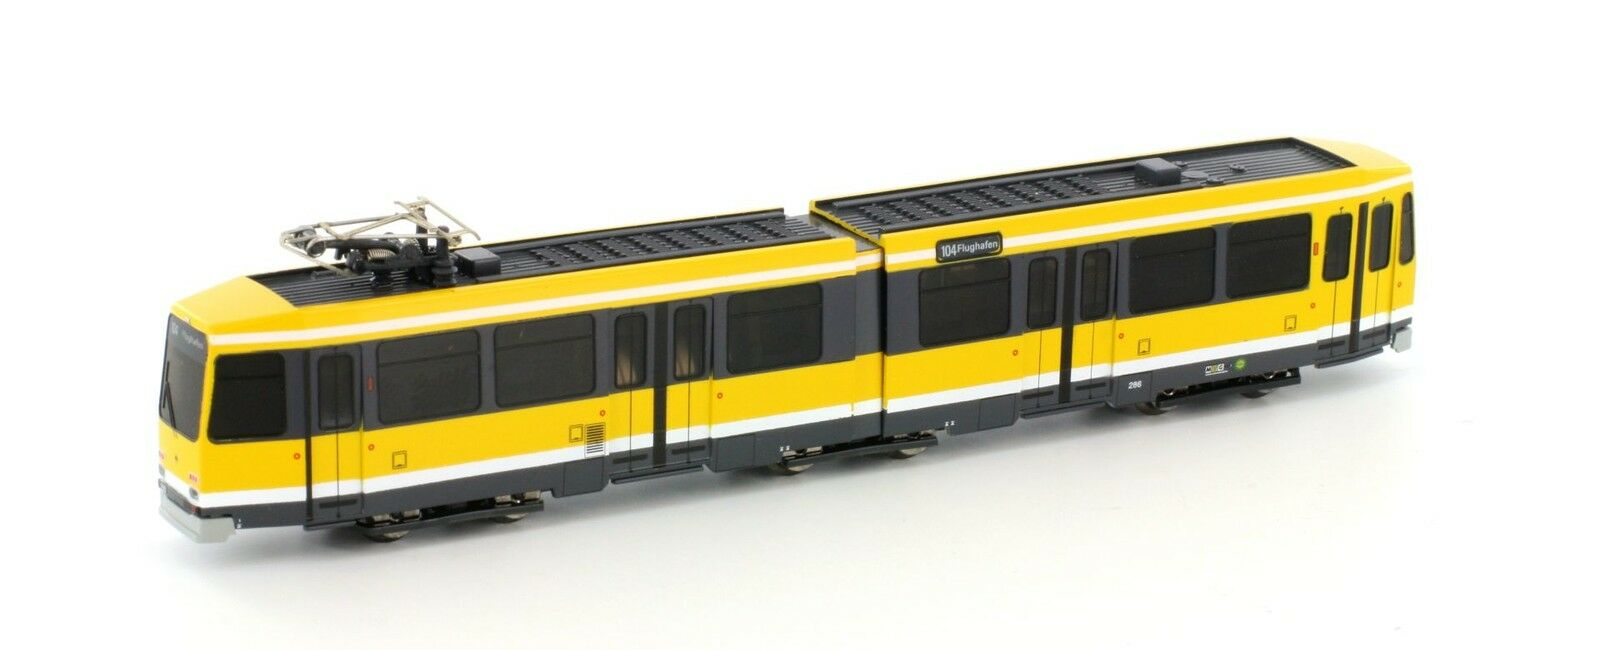 Hobbytrain 14902 tranvía düwag m6  RFA Ruhr  Analog  neu en OVP